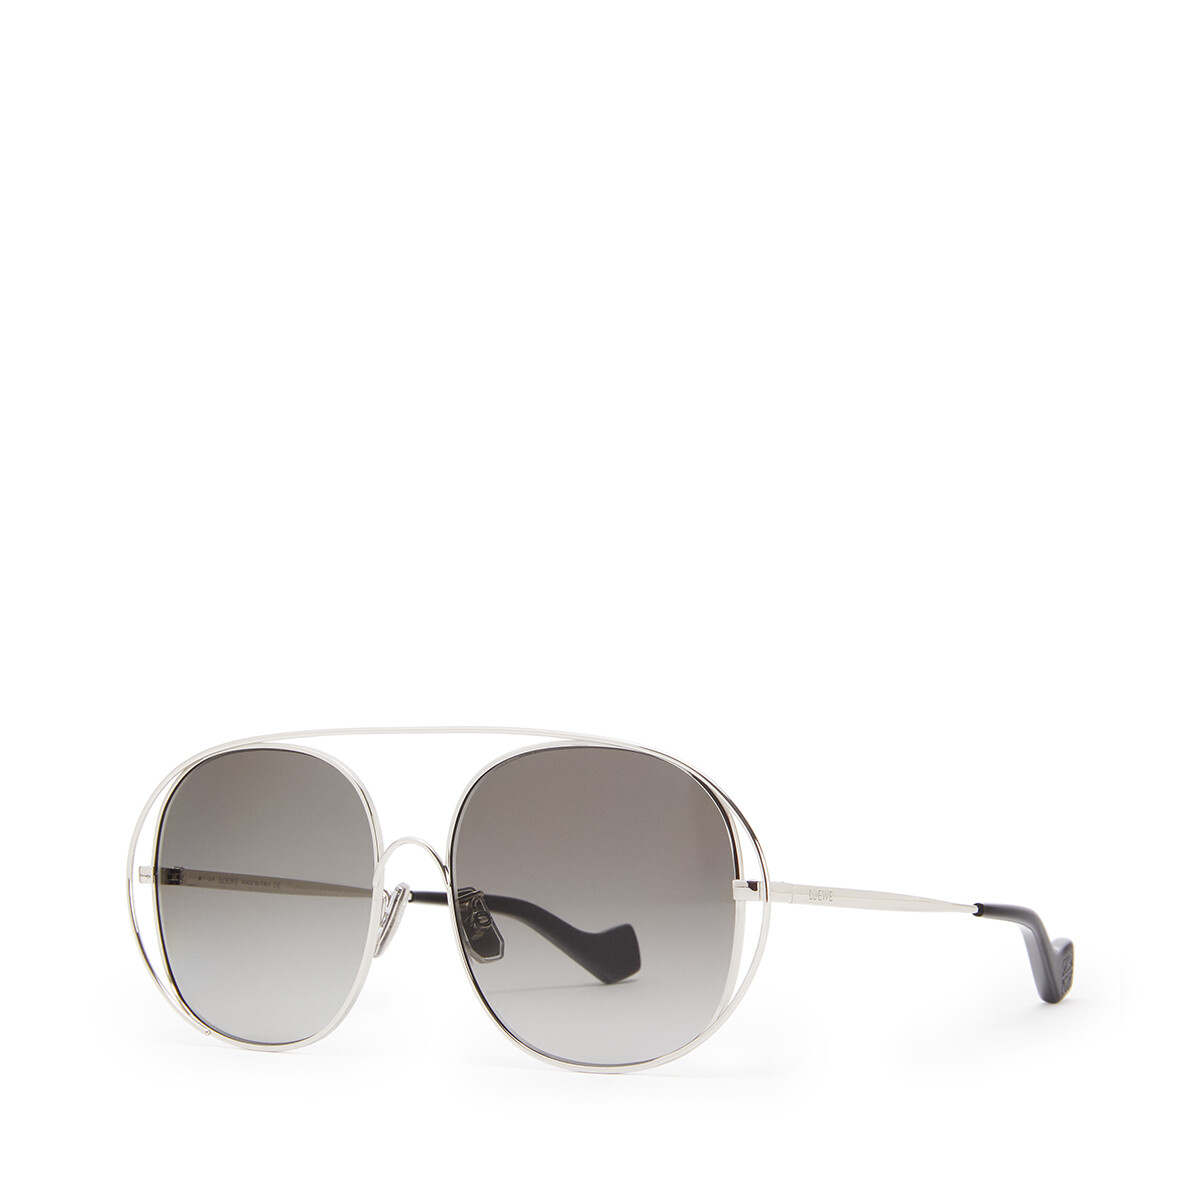 LOEWE Metal Round Sunglasses Anthracite front